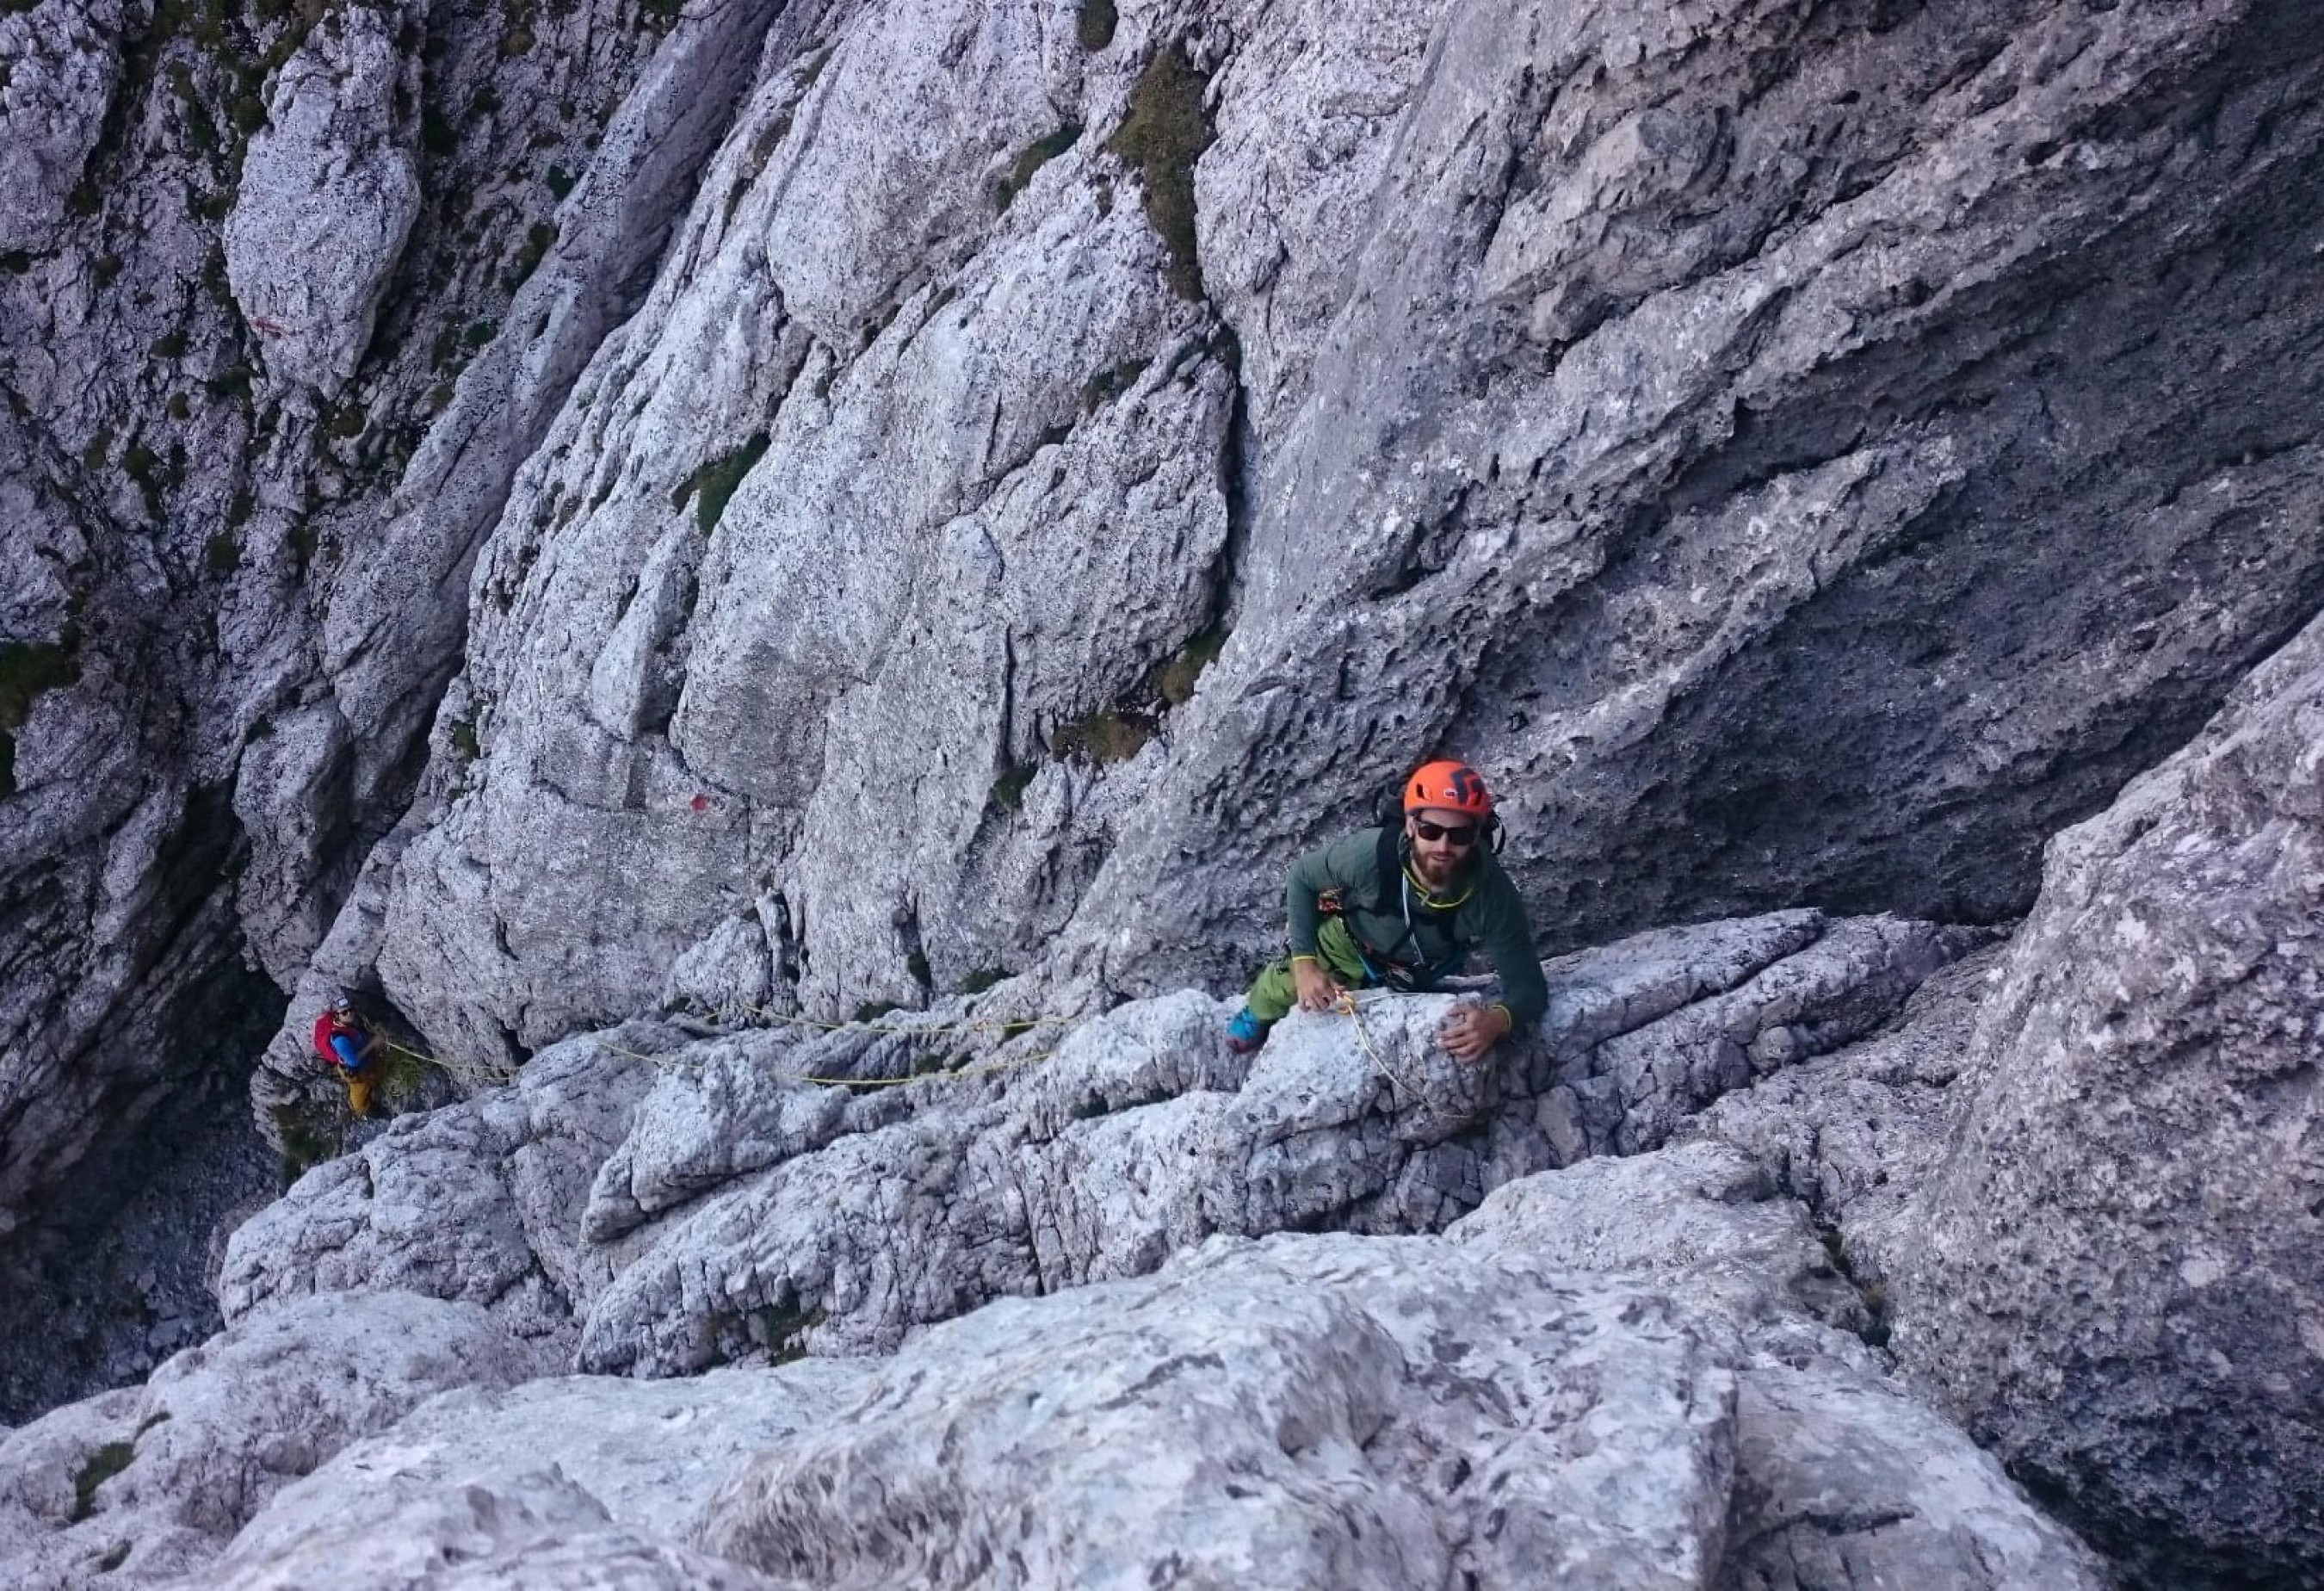 Klettersteig Johann : Check der hochalmblick klettersteig d e bergwelten